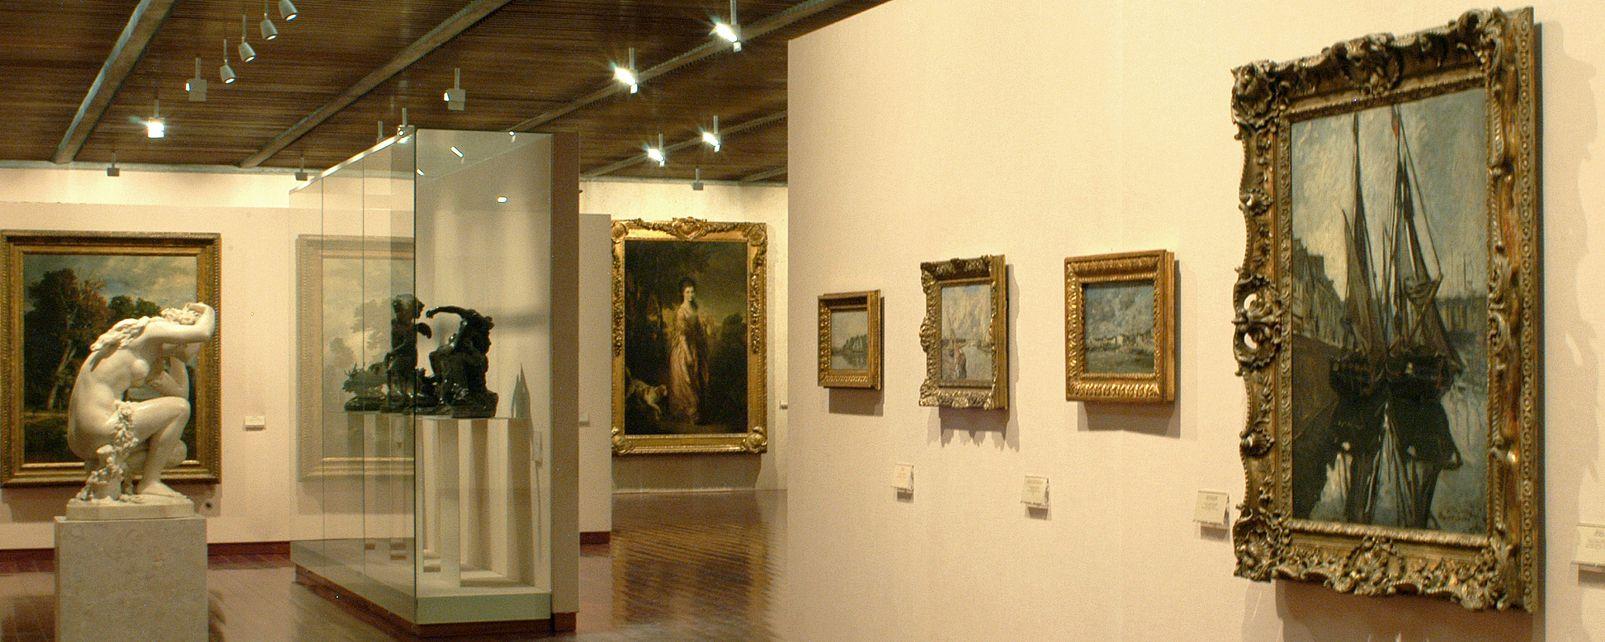 Musée Calouste-Gulbenkian , Portugal